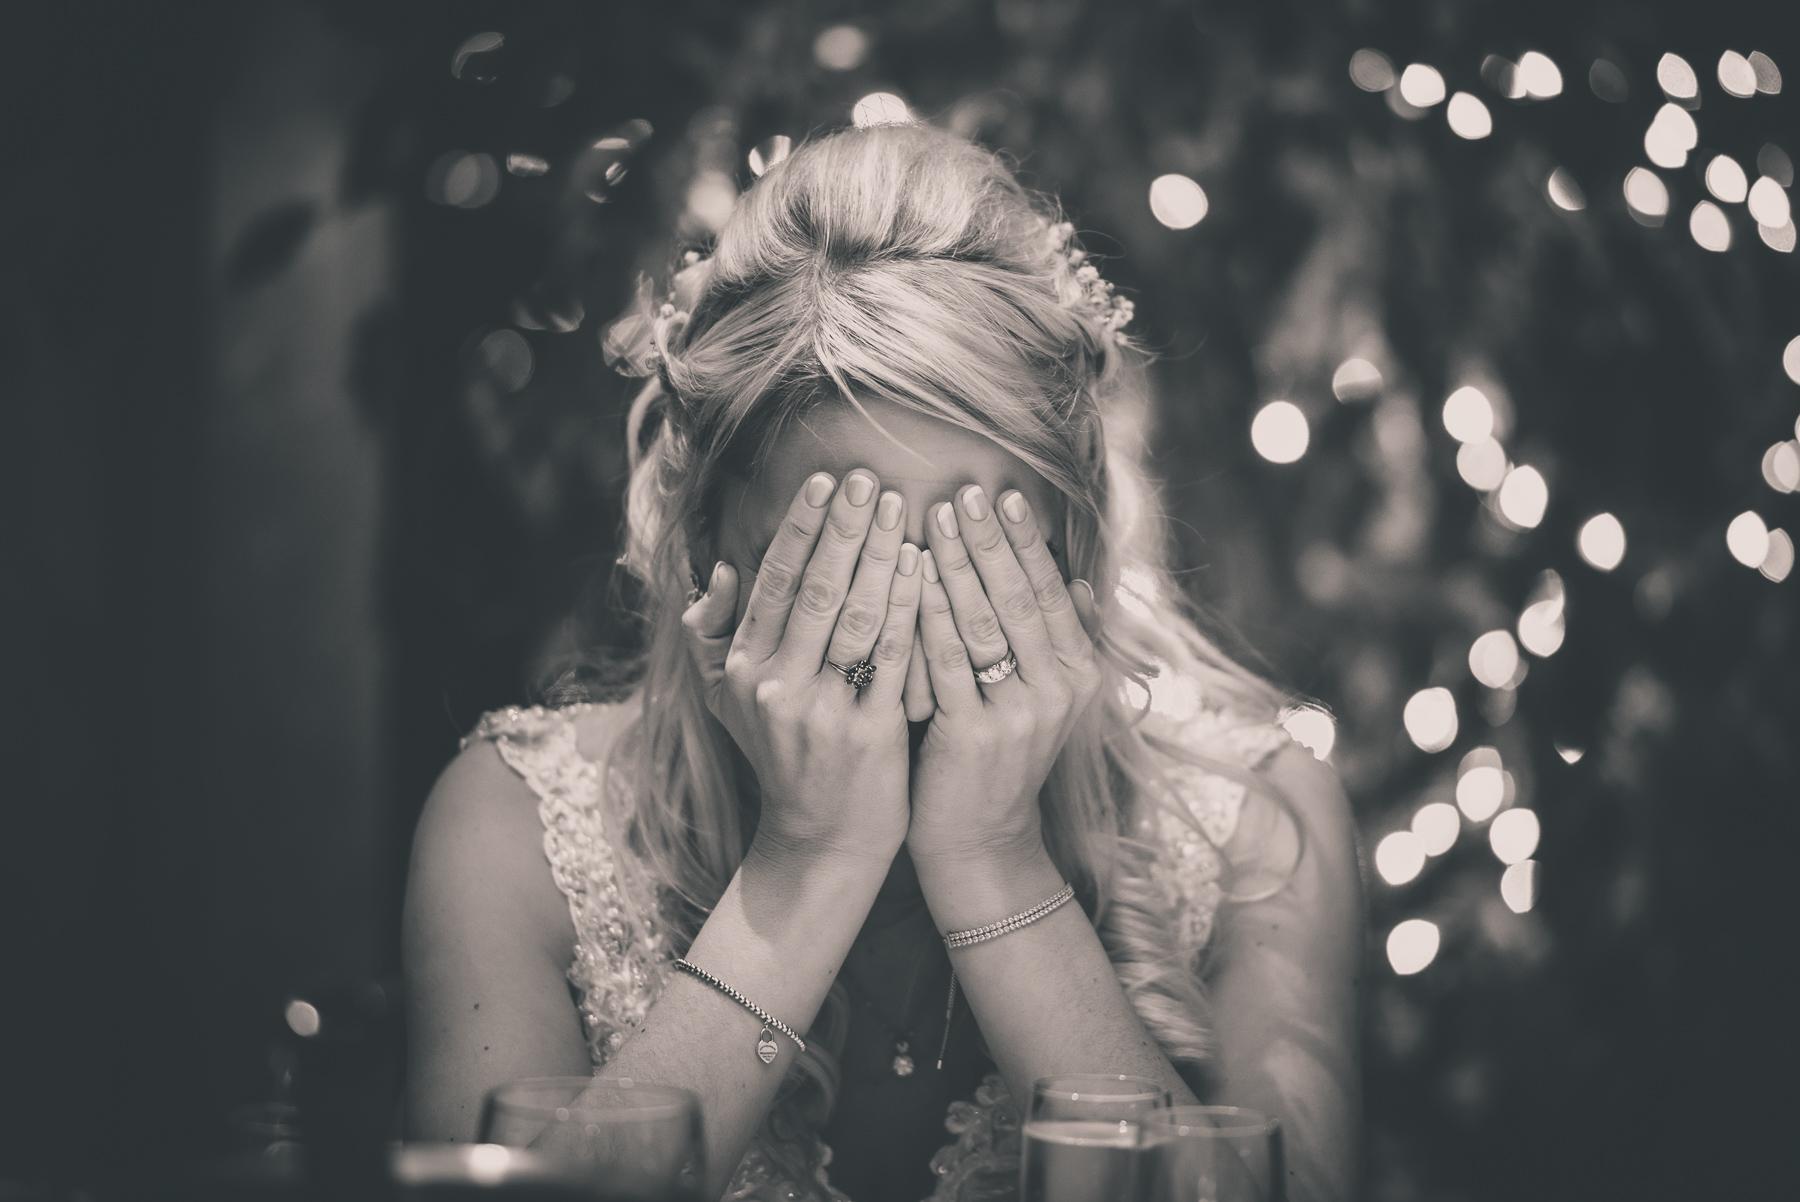 Embarrassed Bride at Wedding